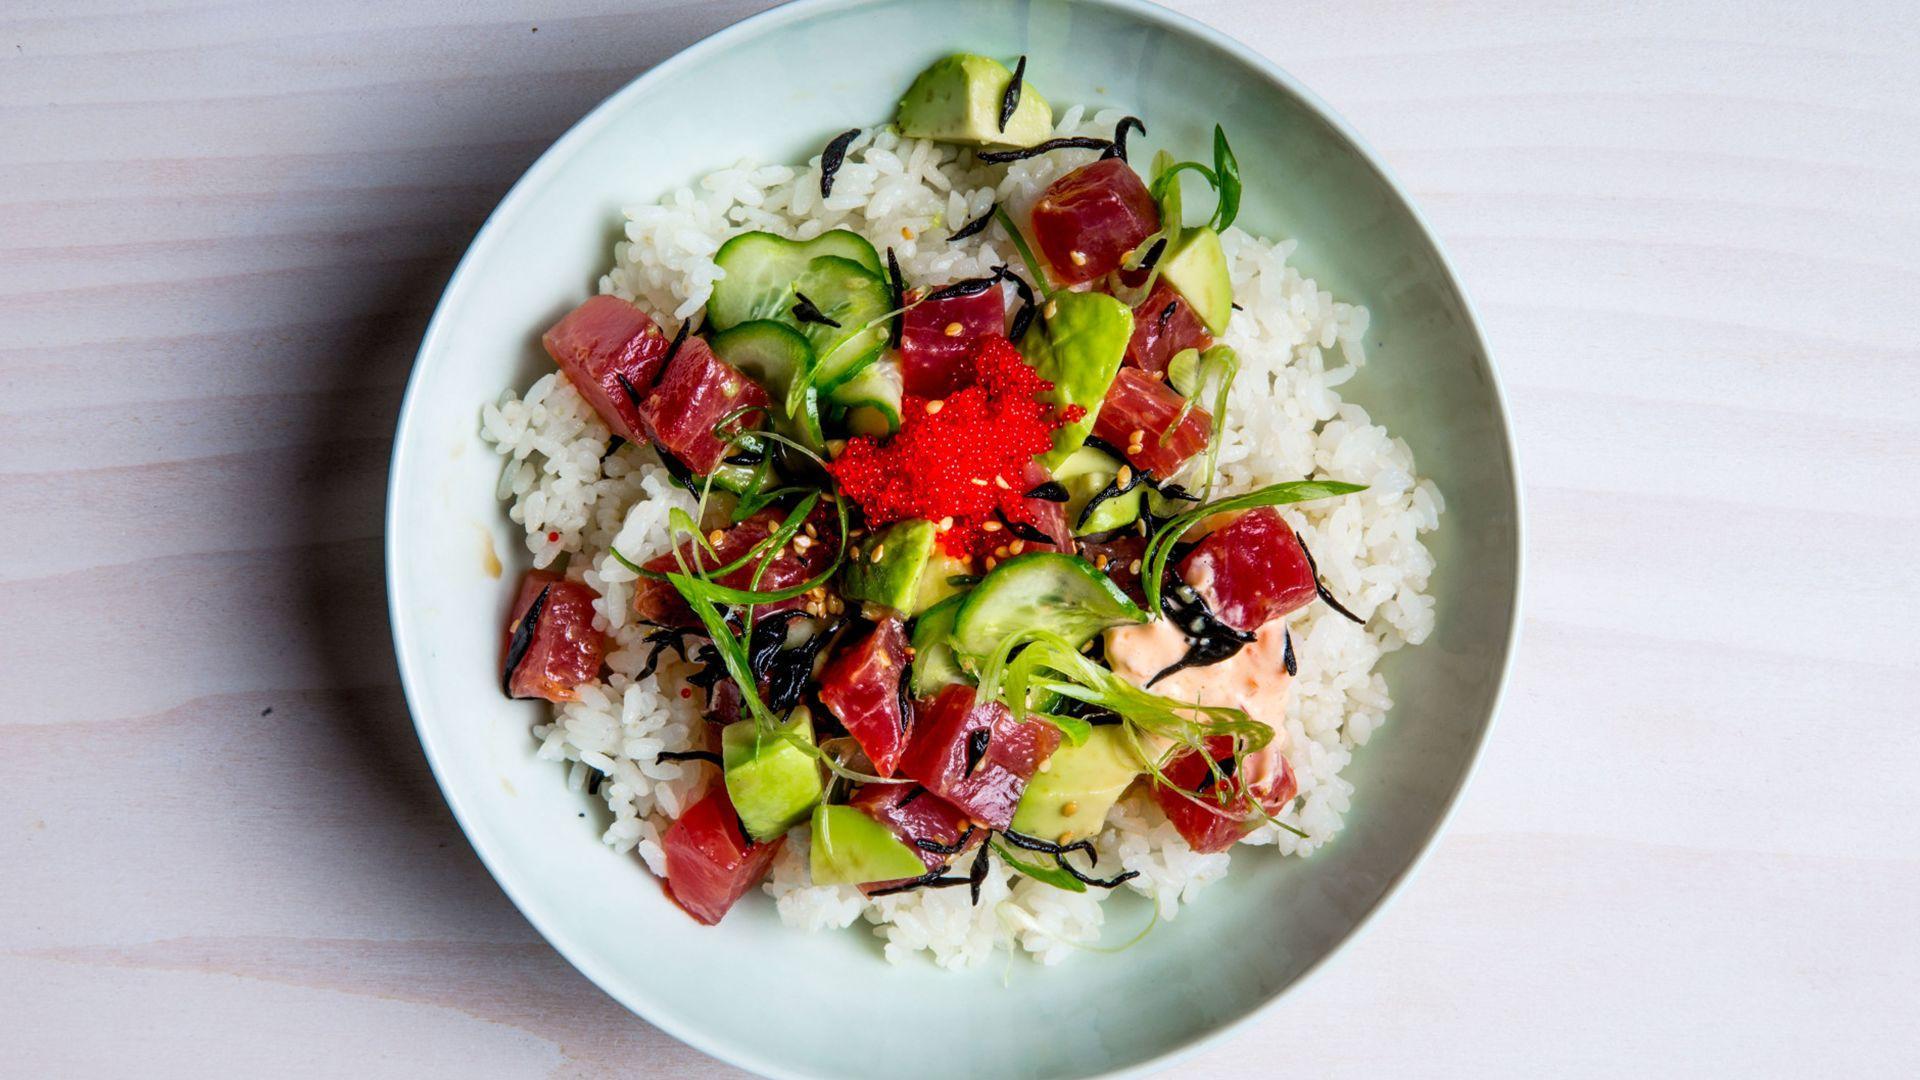 How to Make a Tuna Poke Bowl at Home